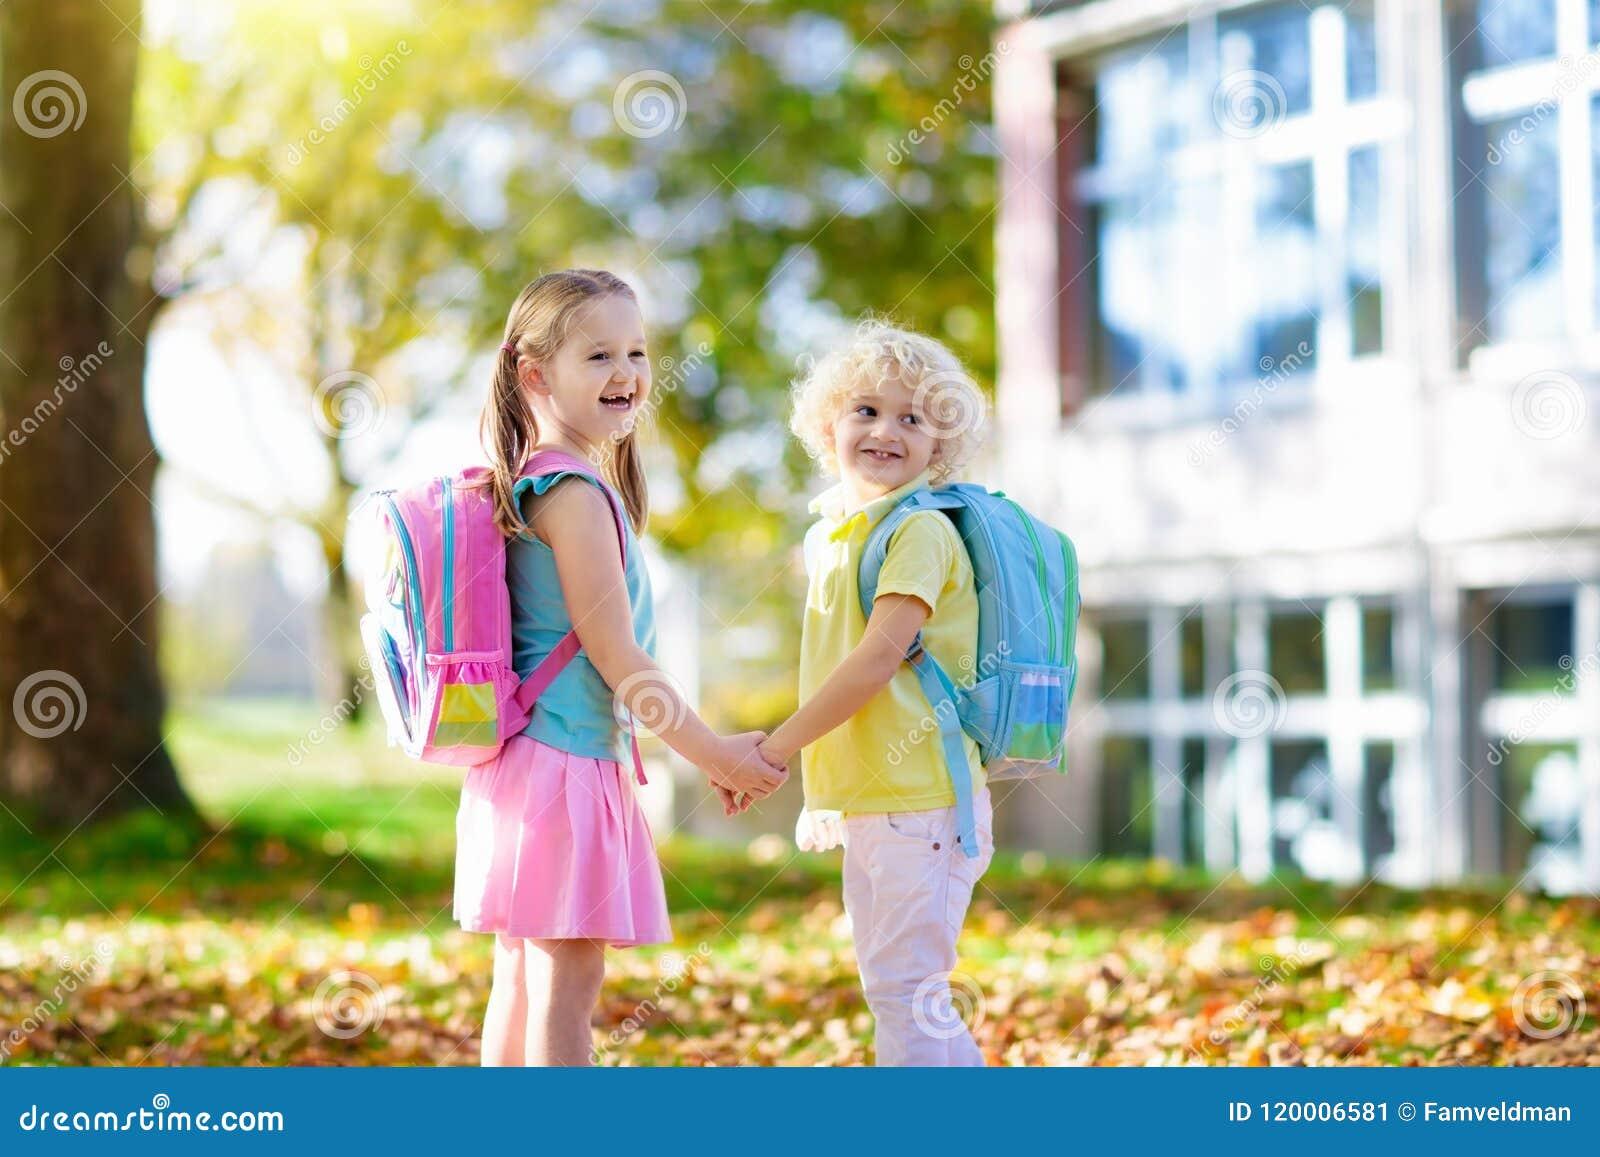 kids go back to school child kindergarten children go back to school start new school year summer vacation boy 120006581 - When Do Kids Go To Kindergarten